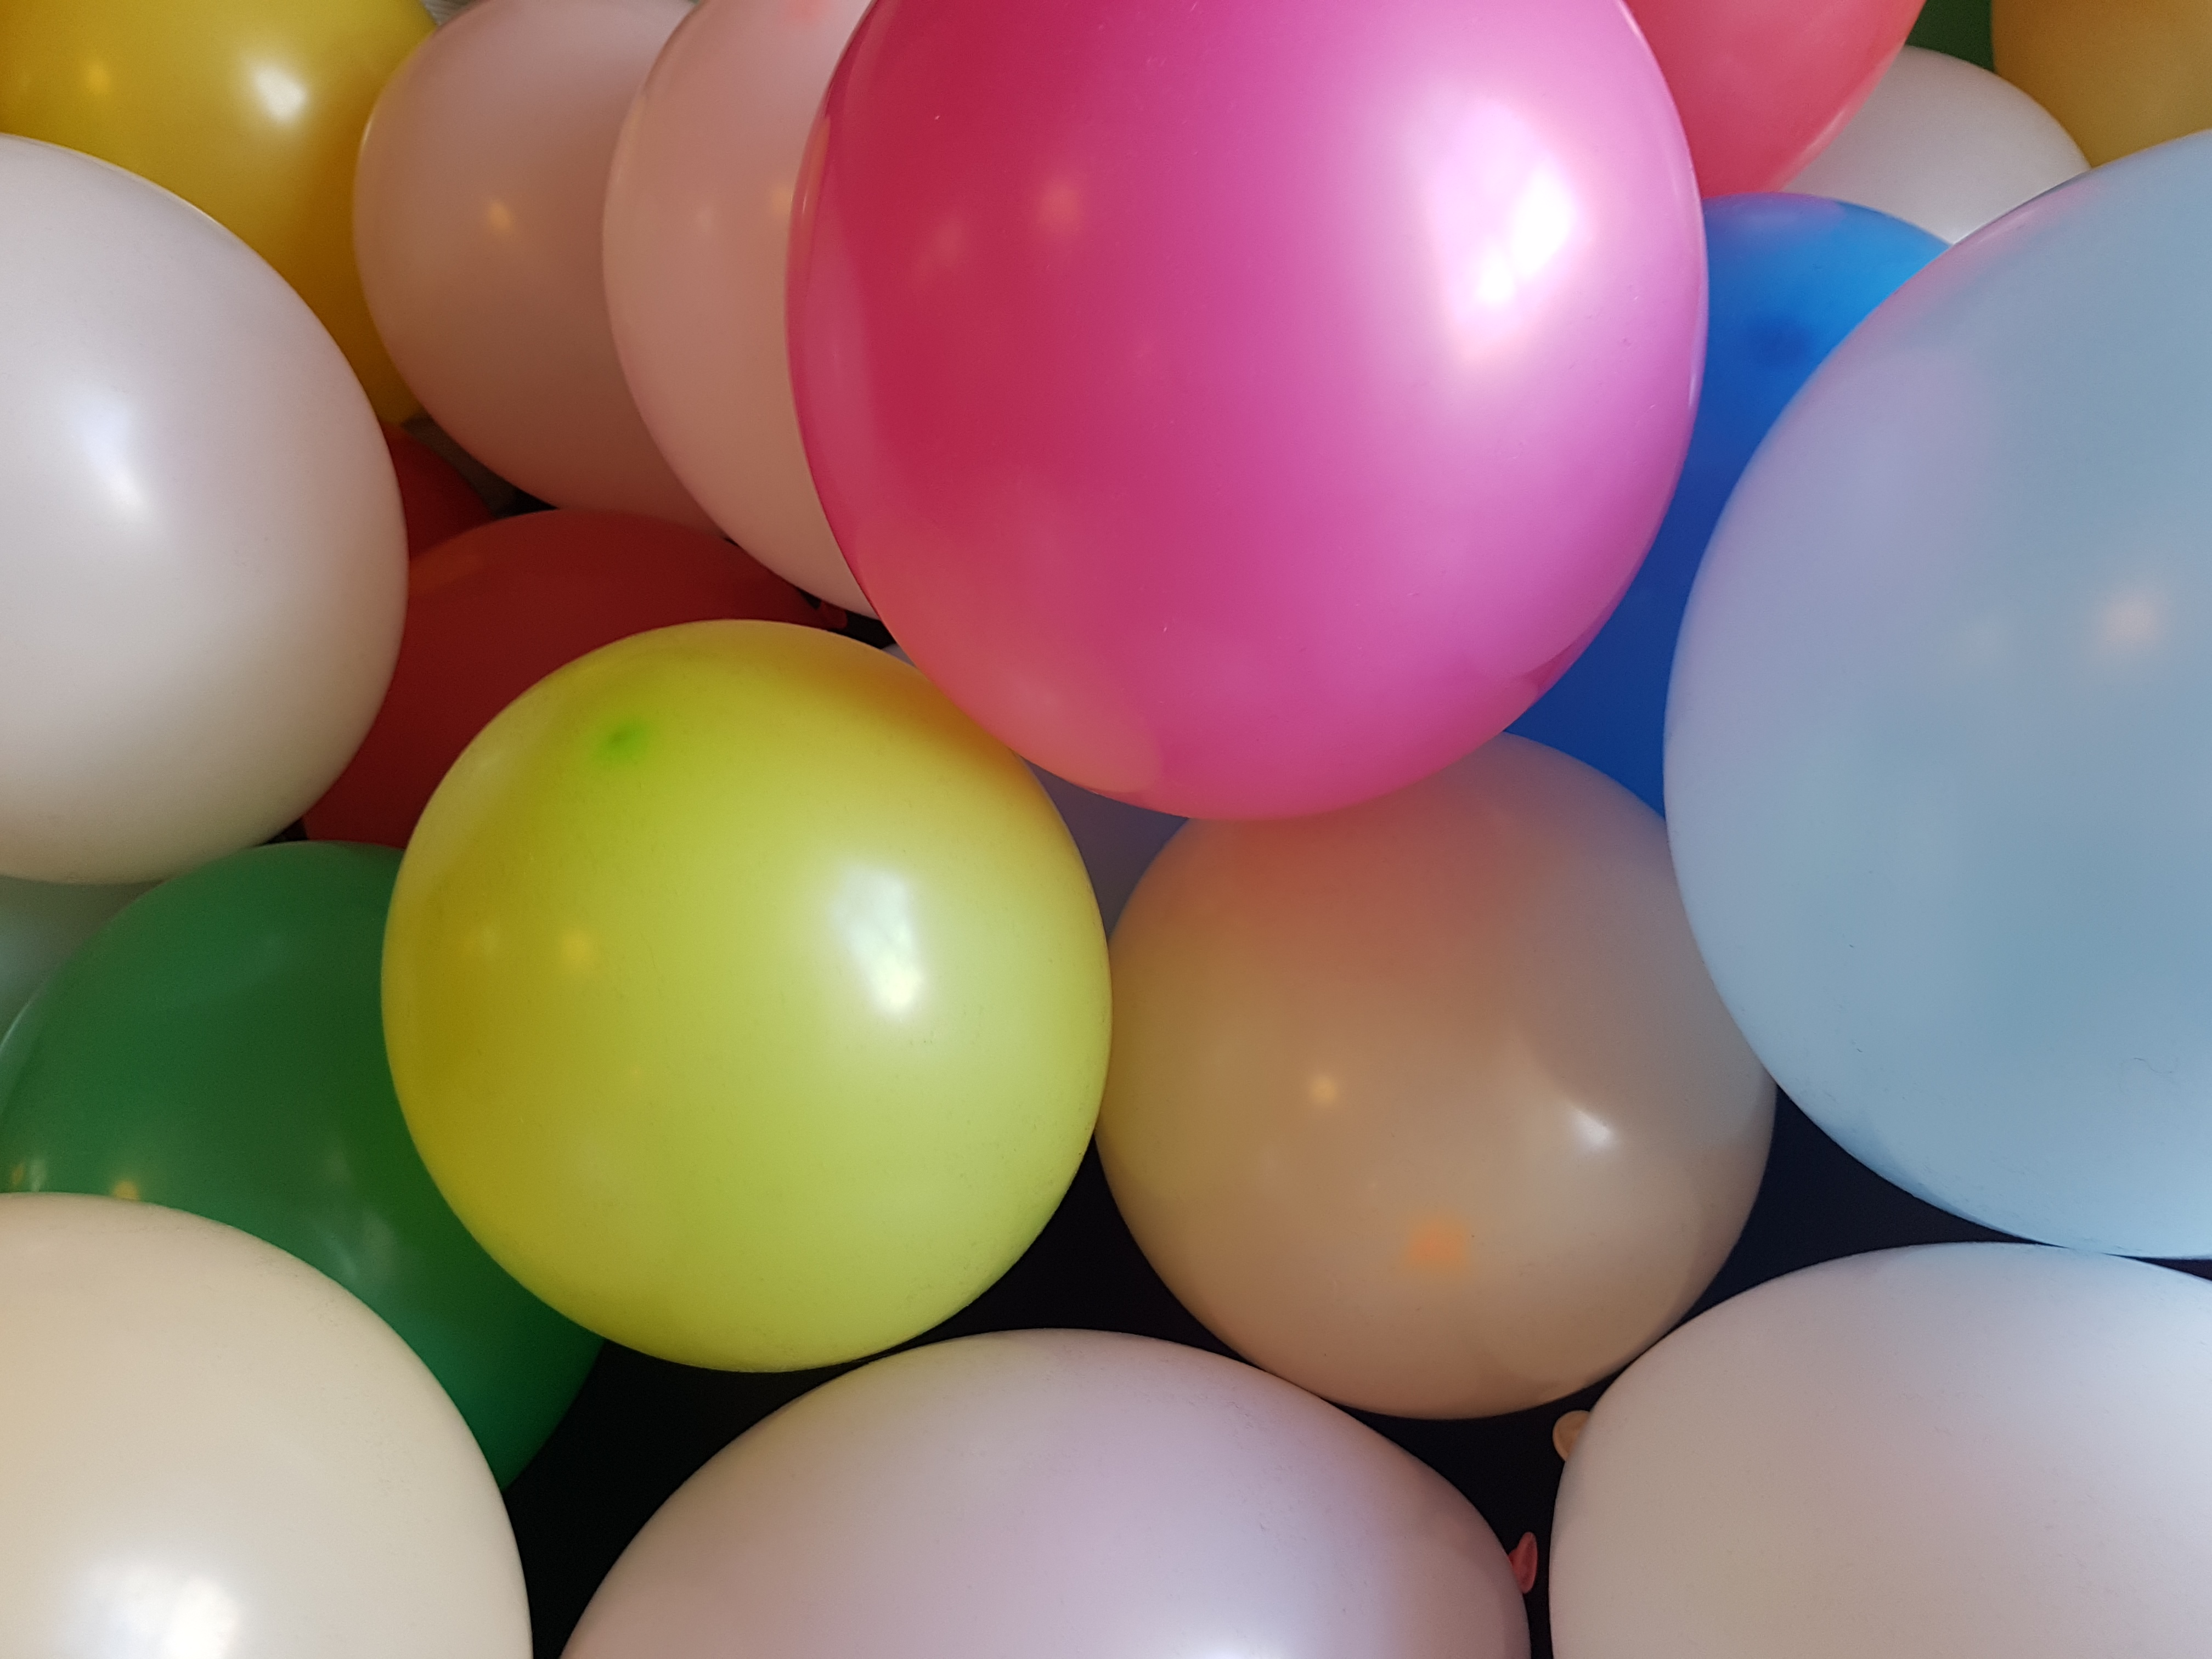 Das Foto zeigt bunte Luftballons.